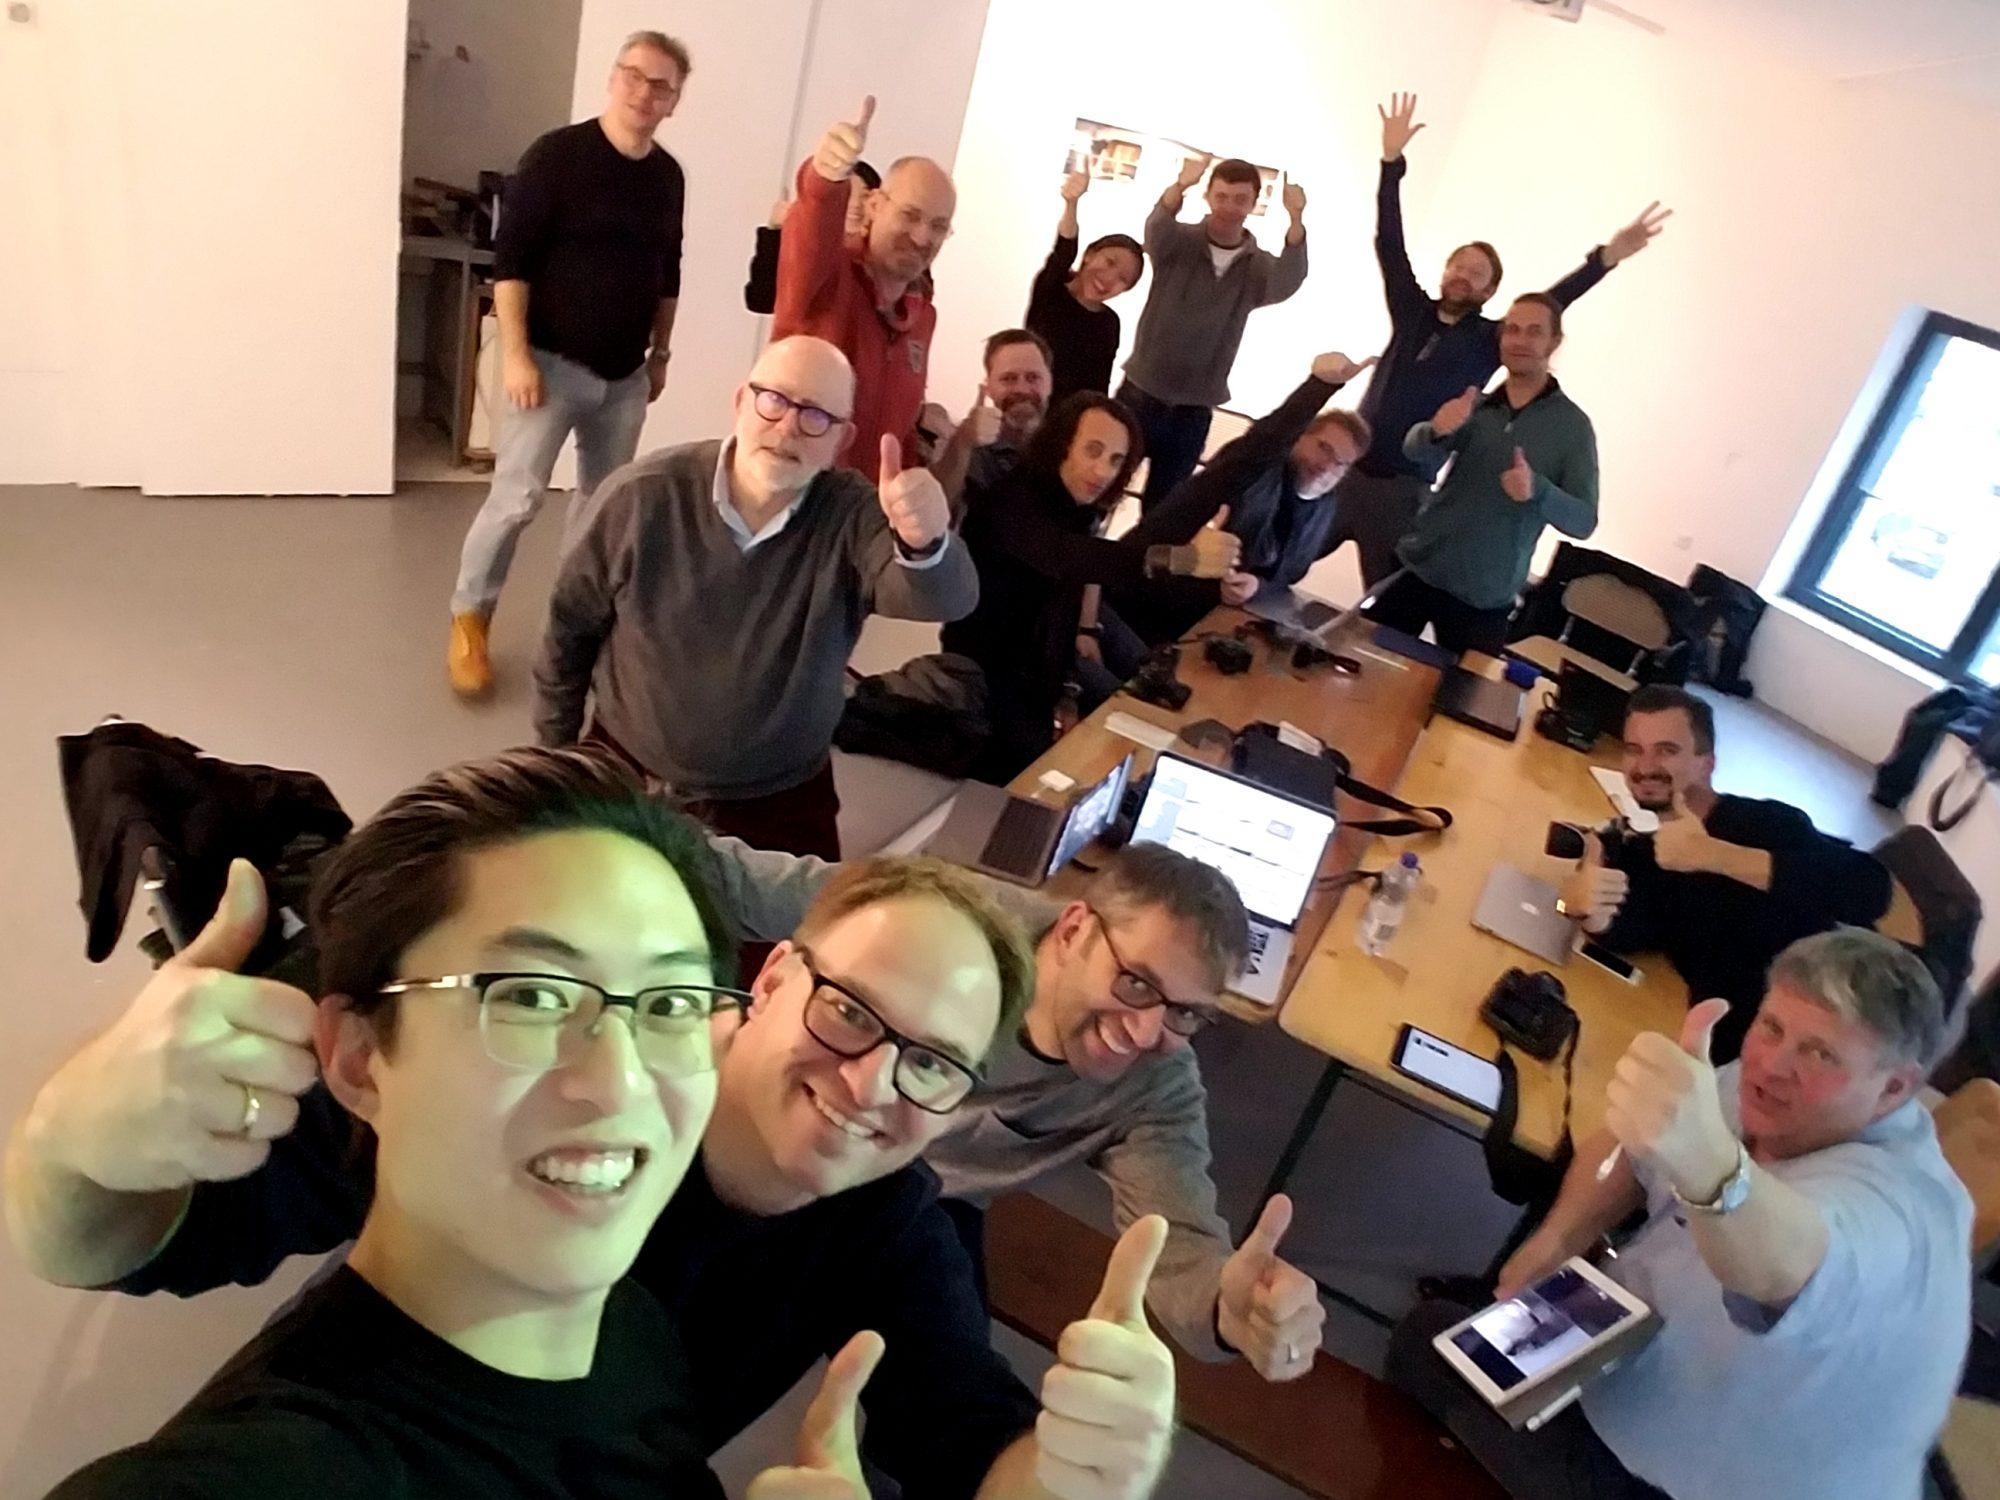 Selfie from ERIC KIM BERLIN WORKSHOP